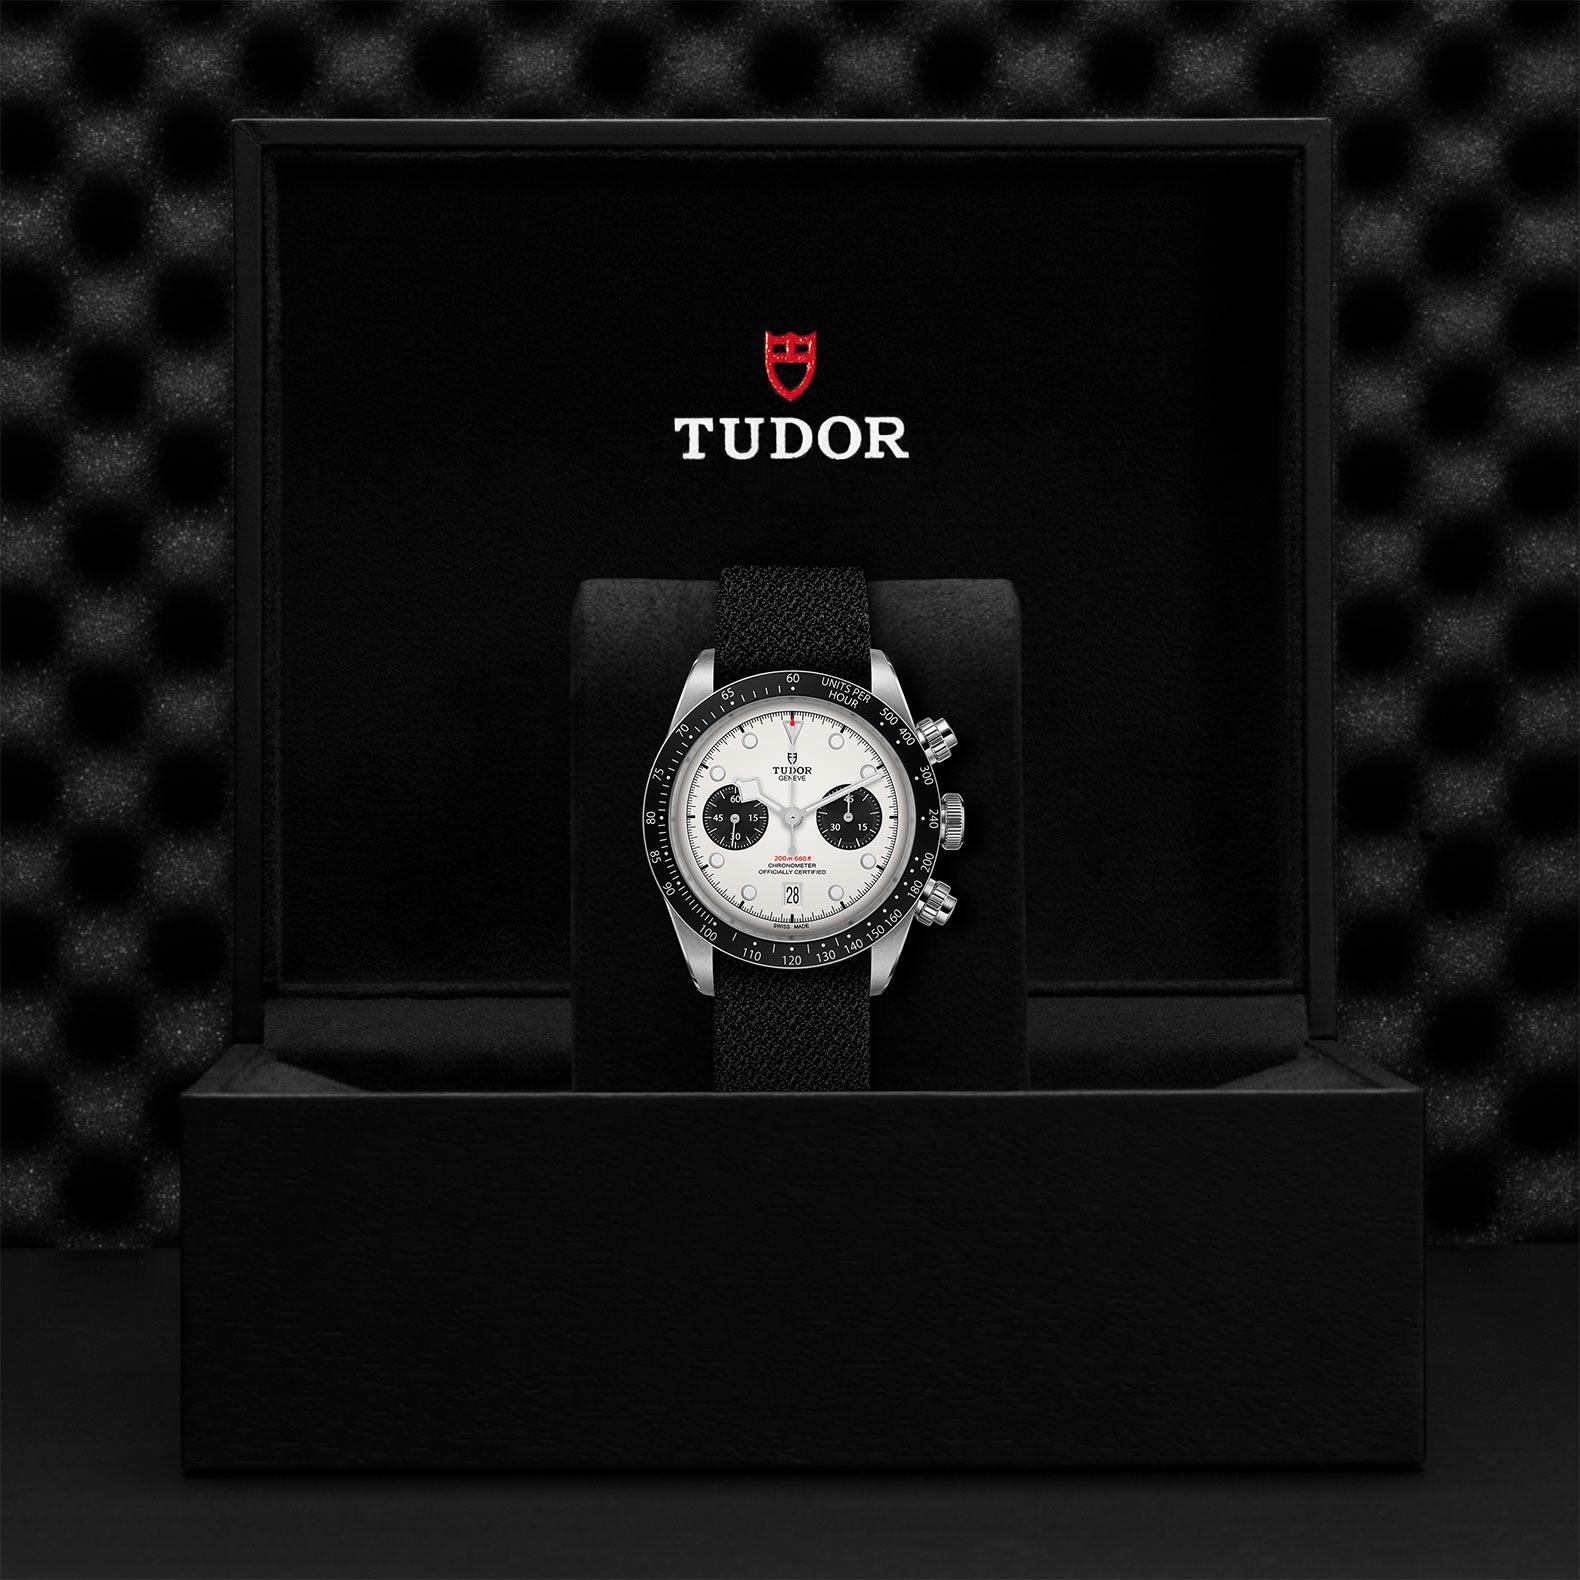 TUDOR Black Bay Chrono - M79360N-0008